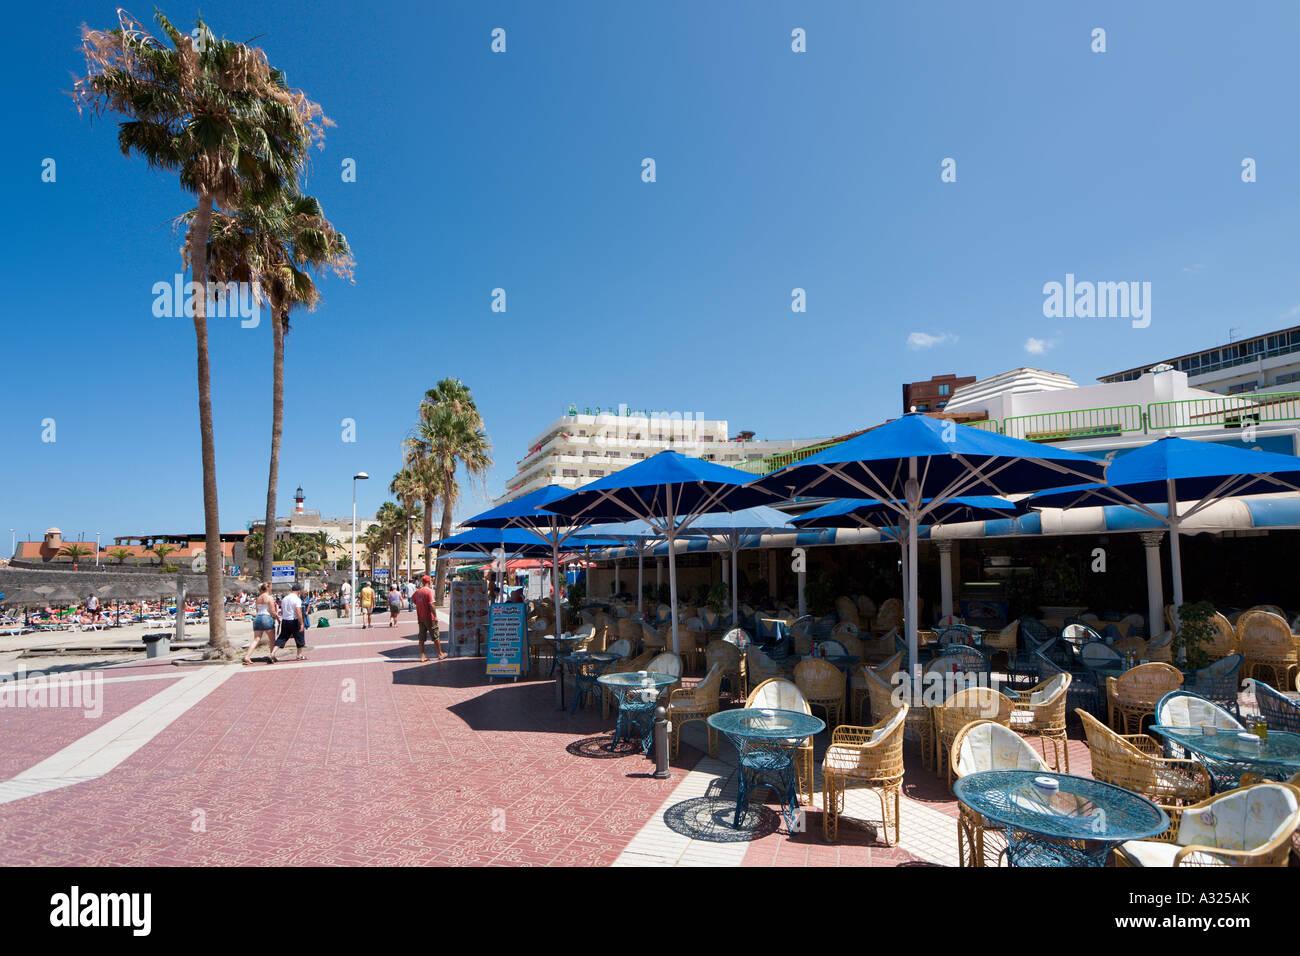 Beachfront cafes, Playa de la Pinta, Costa Adeje, Playa de las Americas, Tenerife, Canary Islands, Spain - Stock Image